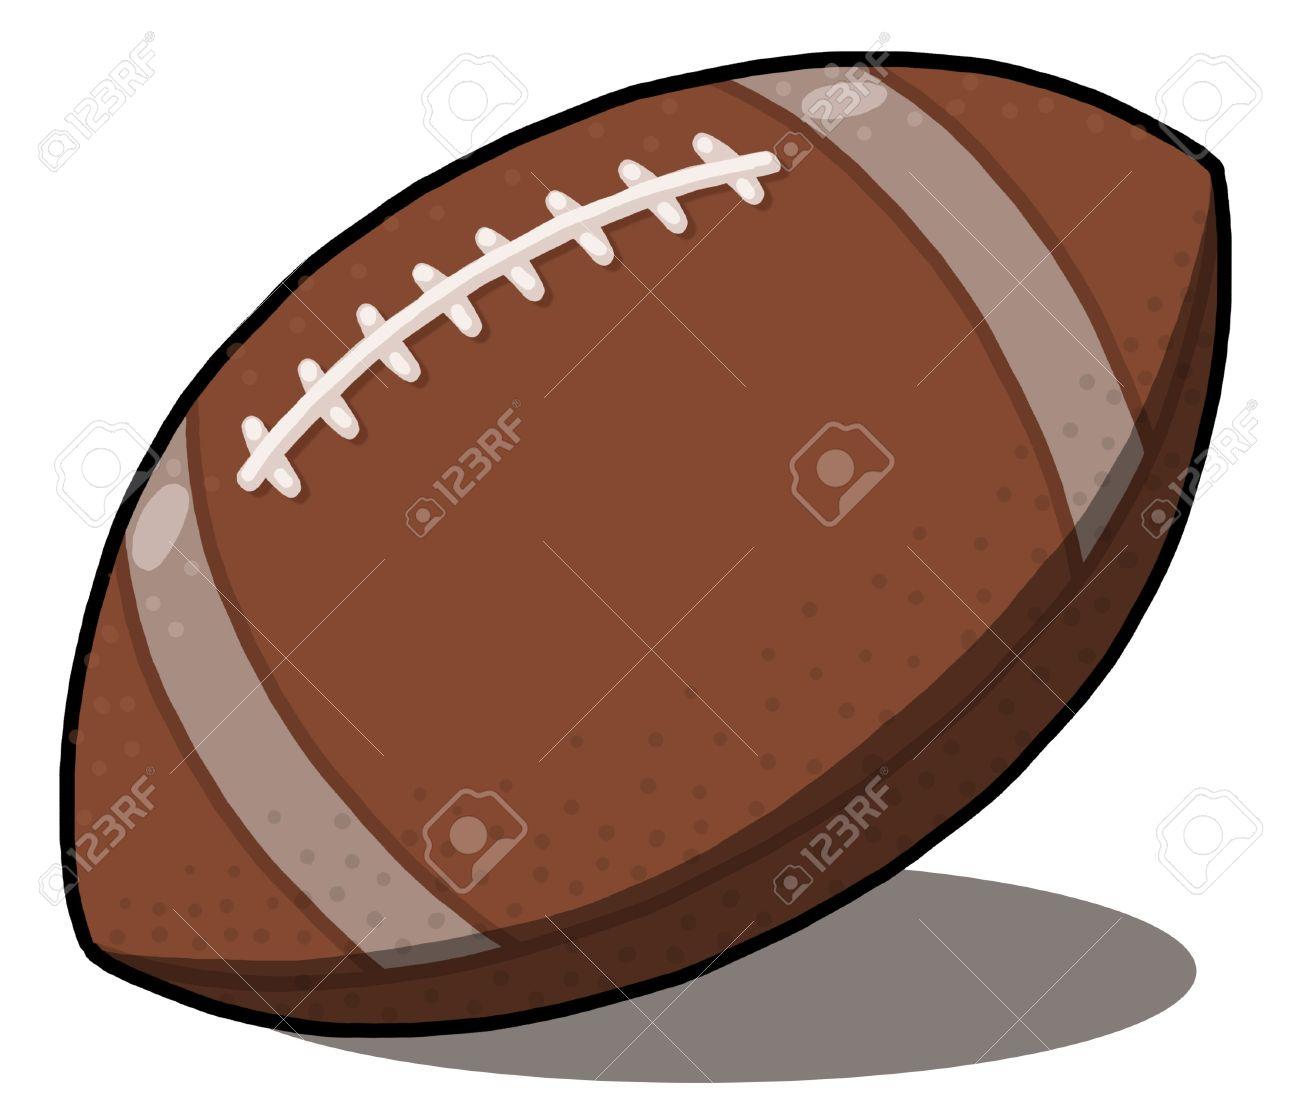 American Football ball Illustration; rugby ball illustration Stock Illustration - 9640754